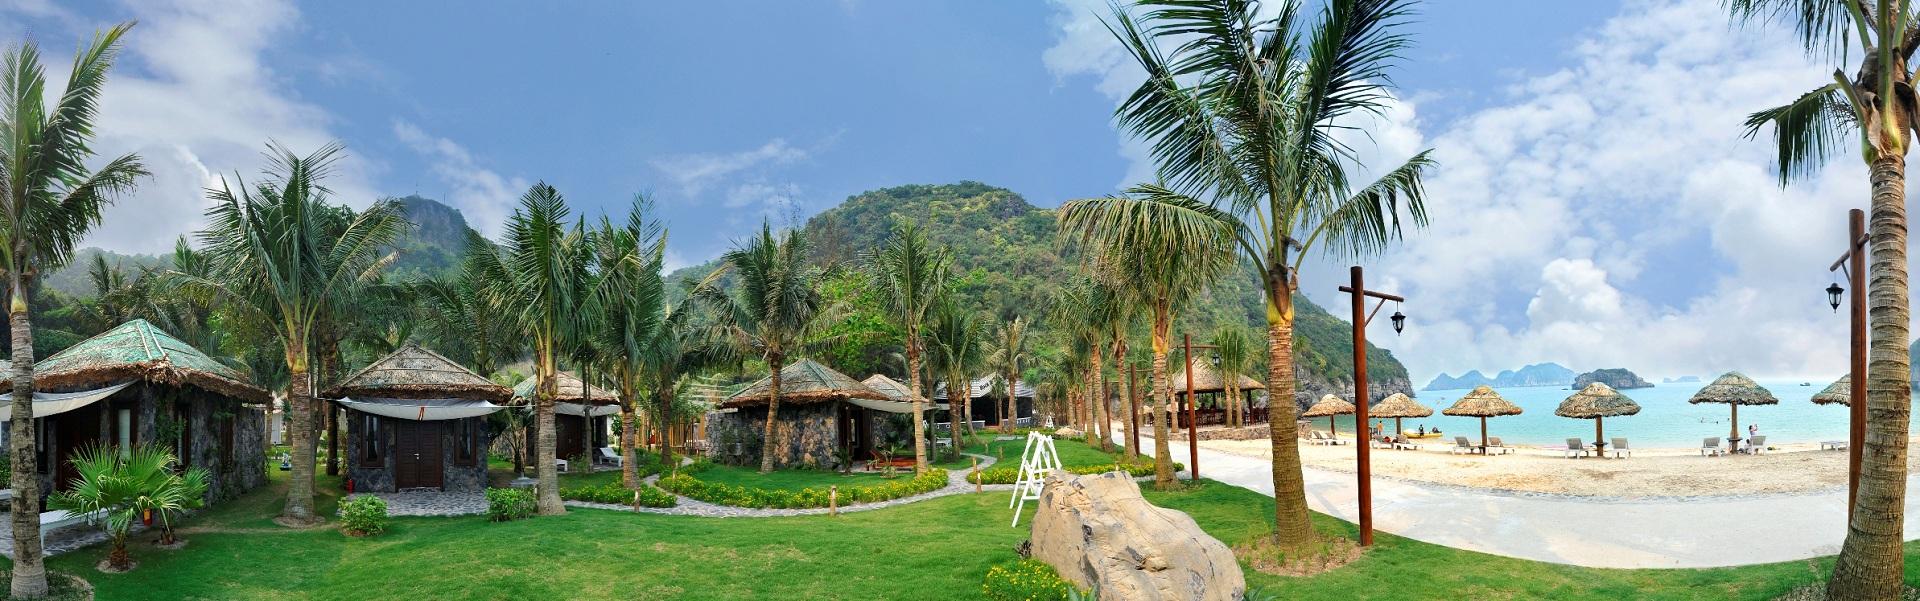 Canh quan Cat Ba Beach Resort